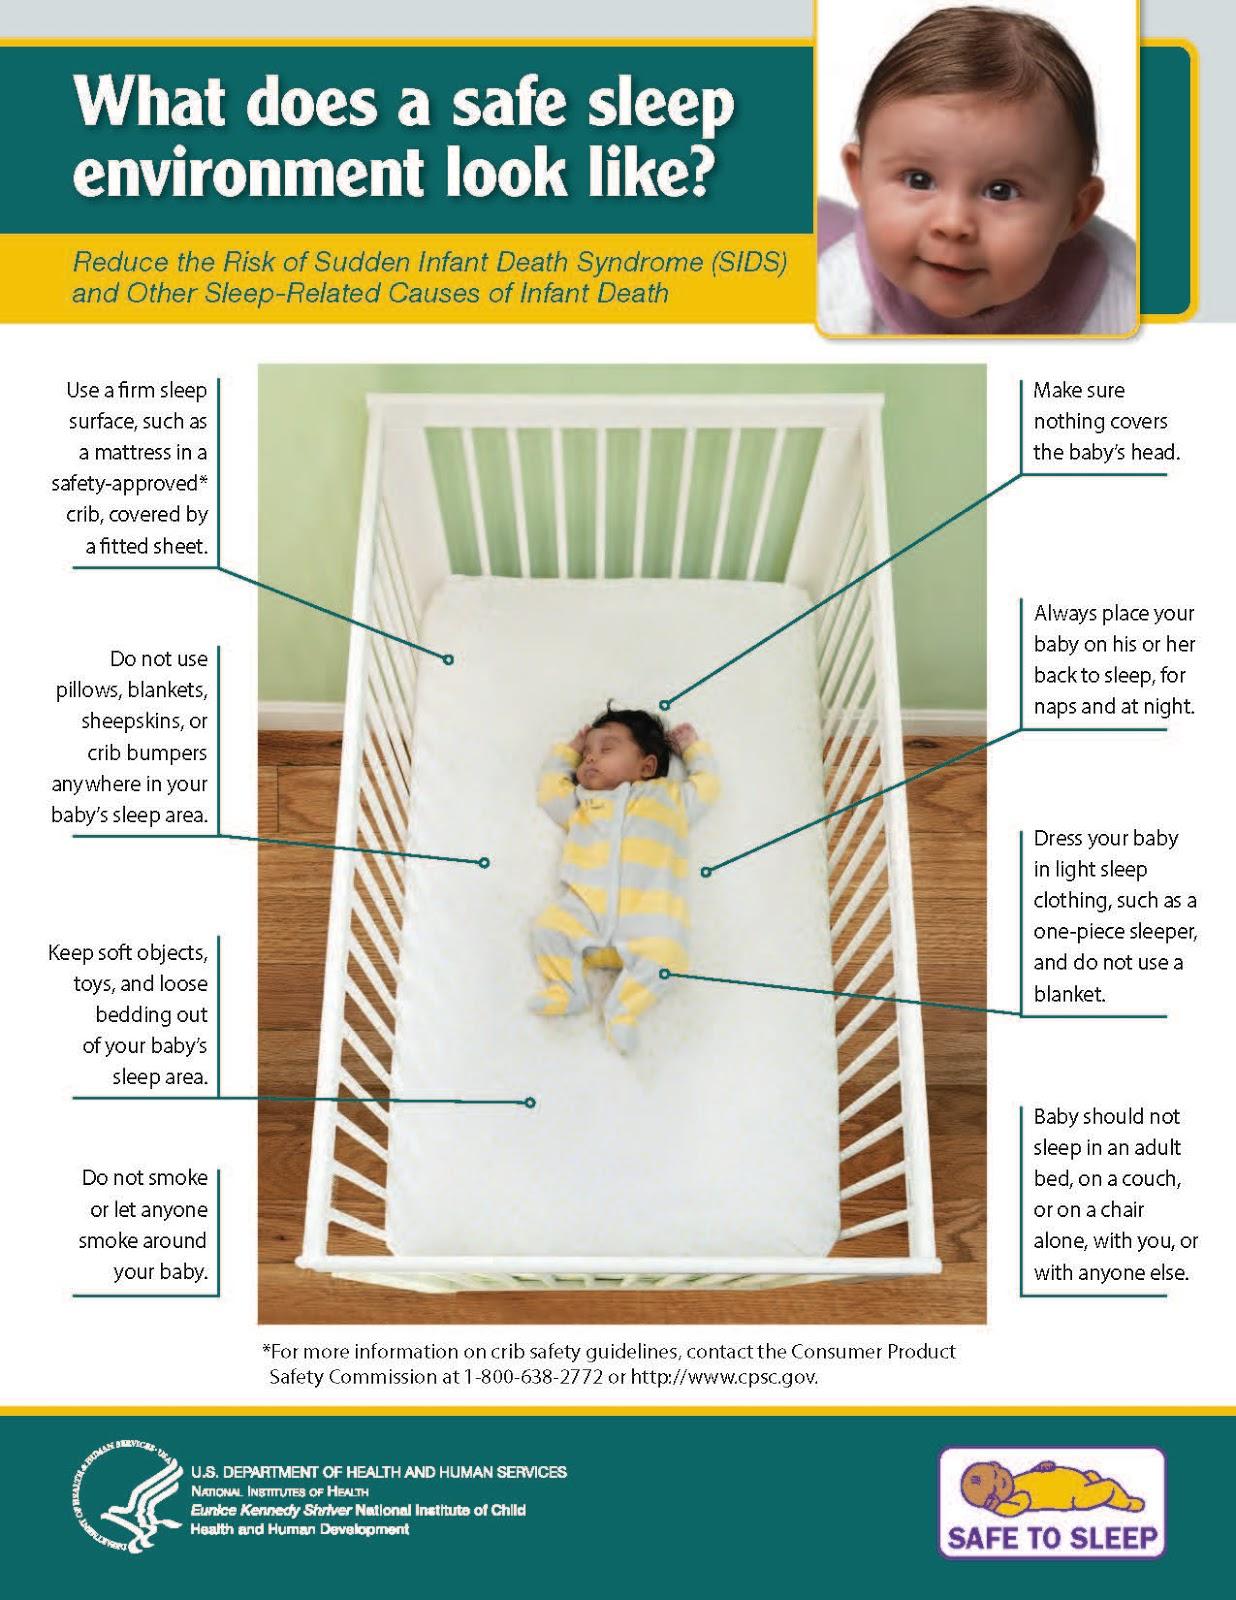 Shelia S Ece Professional Blog Child Development And